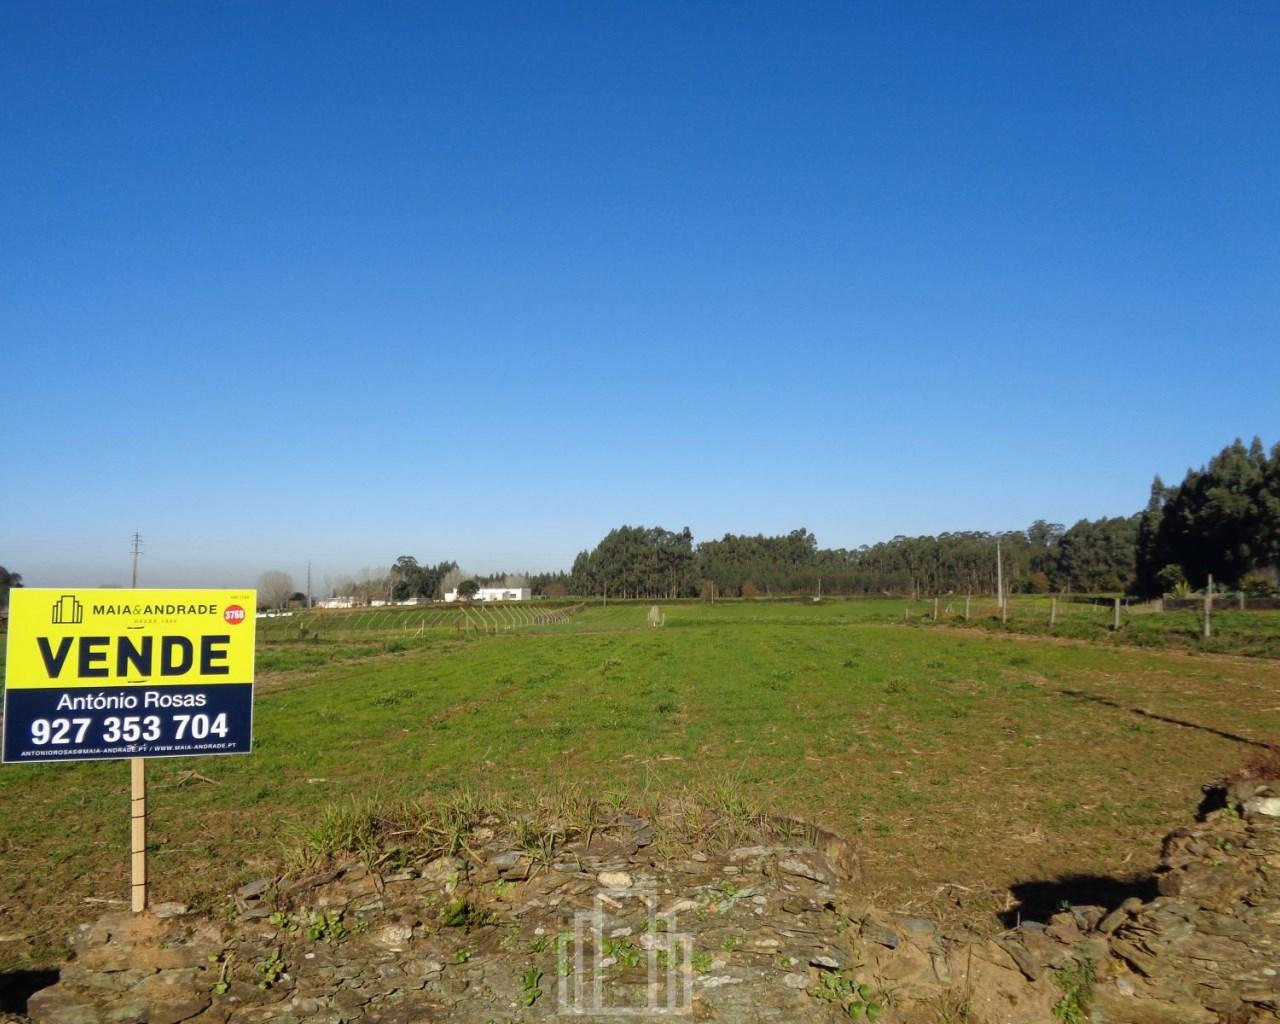 6bec25a468e Rural Land - Ovar - 228 - Maia   Andrade - Soc. Med. Imob.